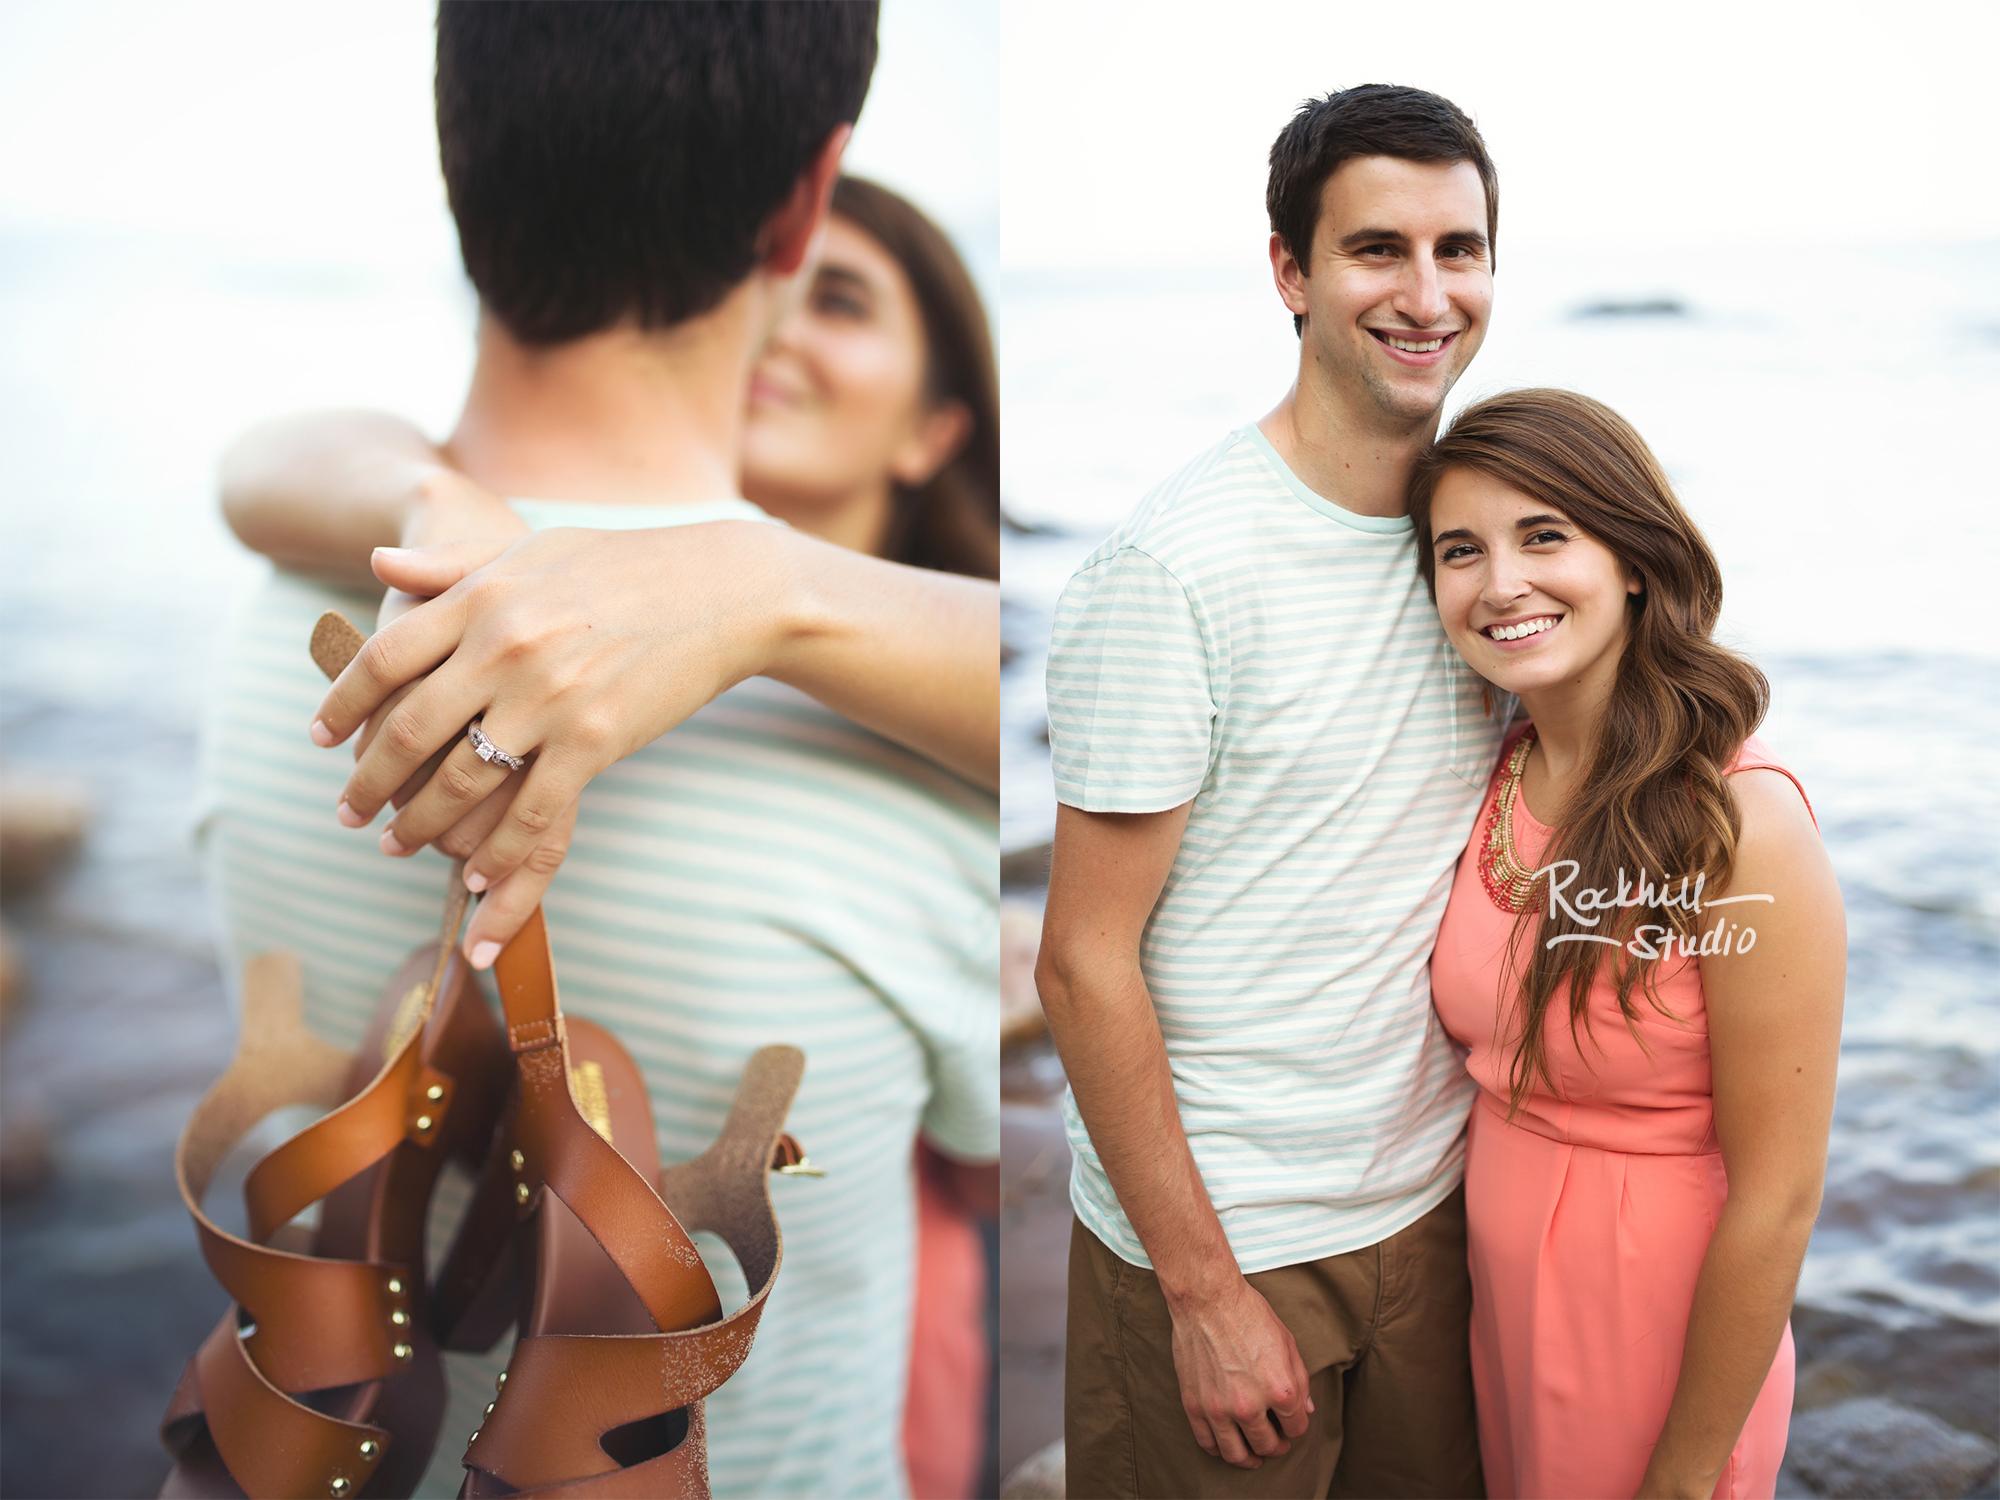 rockhill-studio-marquette-michigan-upper-peninsula-engagement-photographer-wetmore-landing-lake-superior-wedding-28.jpg